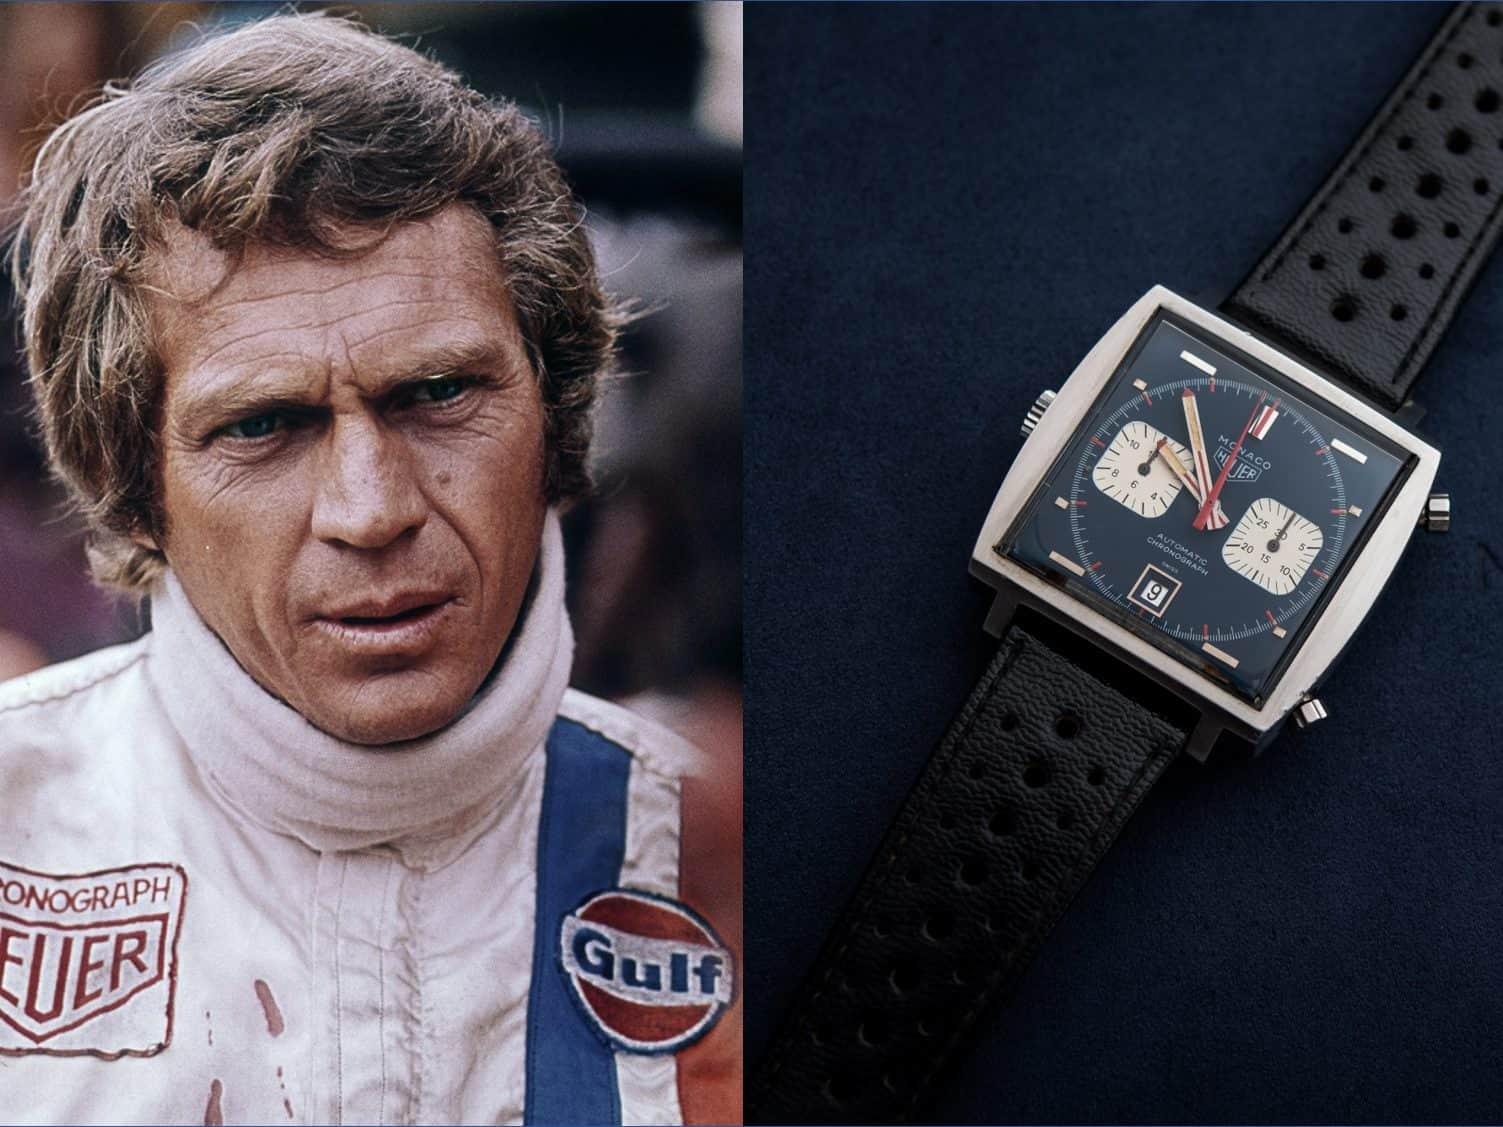 Heuer Monaco Steve McQueen Heuer Monaco Steve McQueen: Das ist ein Rekordpreis!